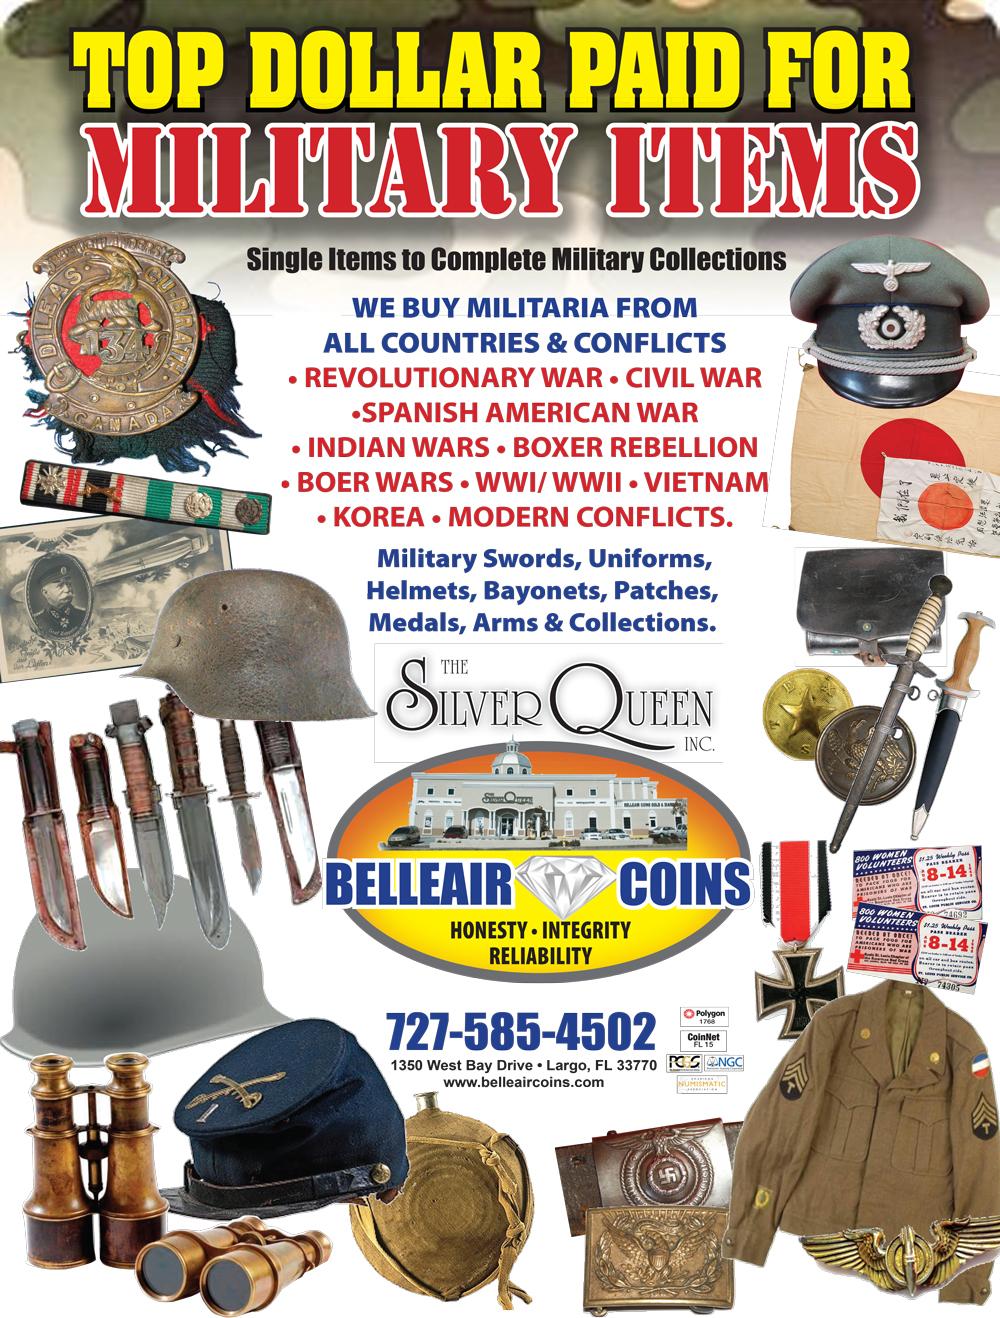 Military Image